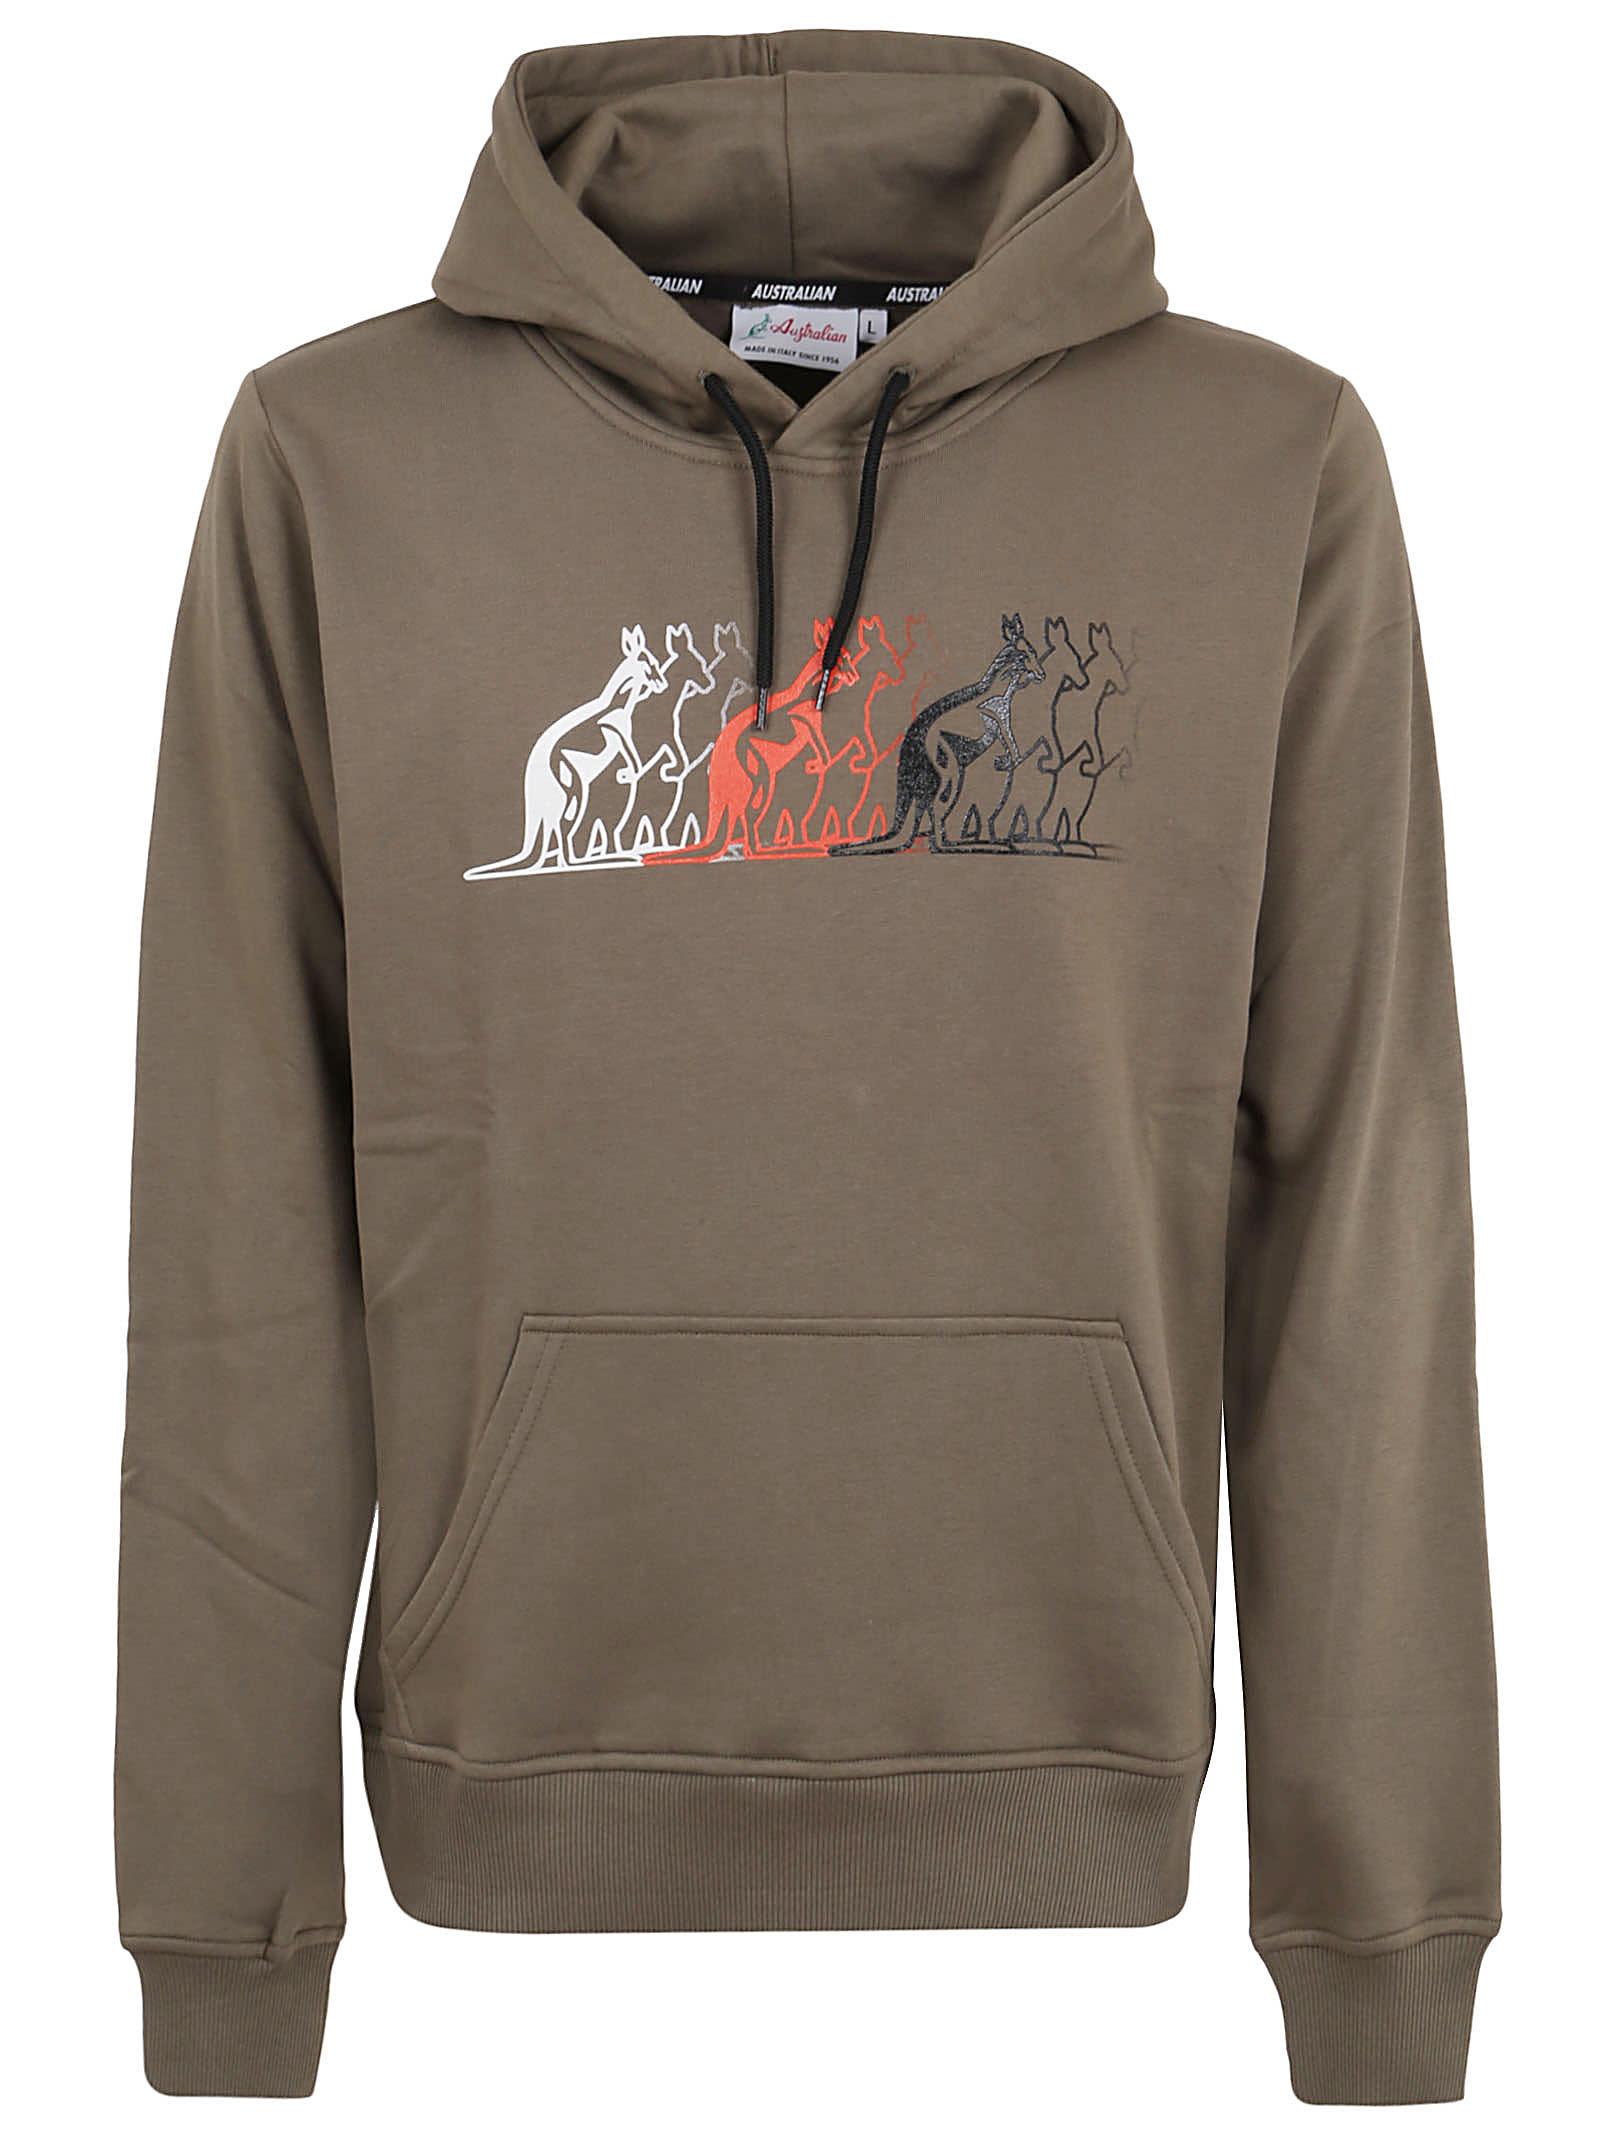 Winter Sweatshirt With Front Print